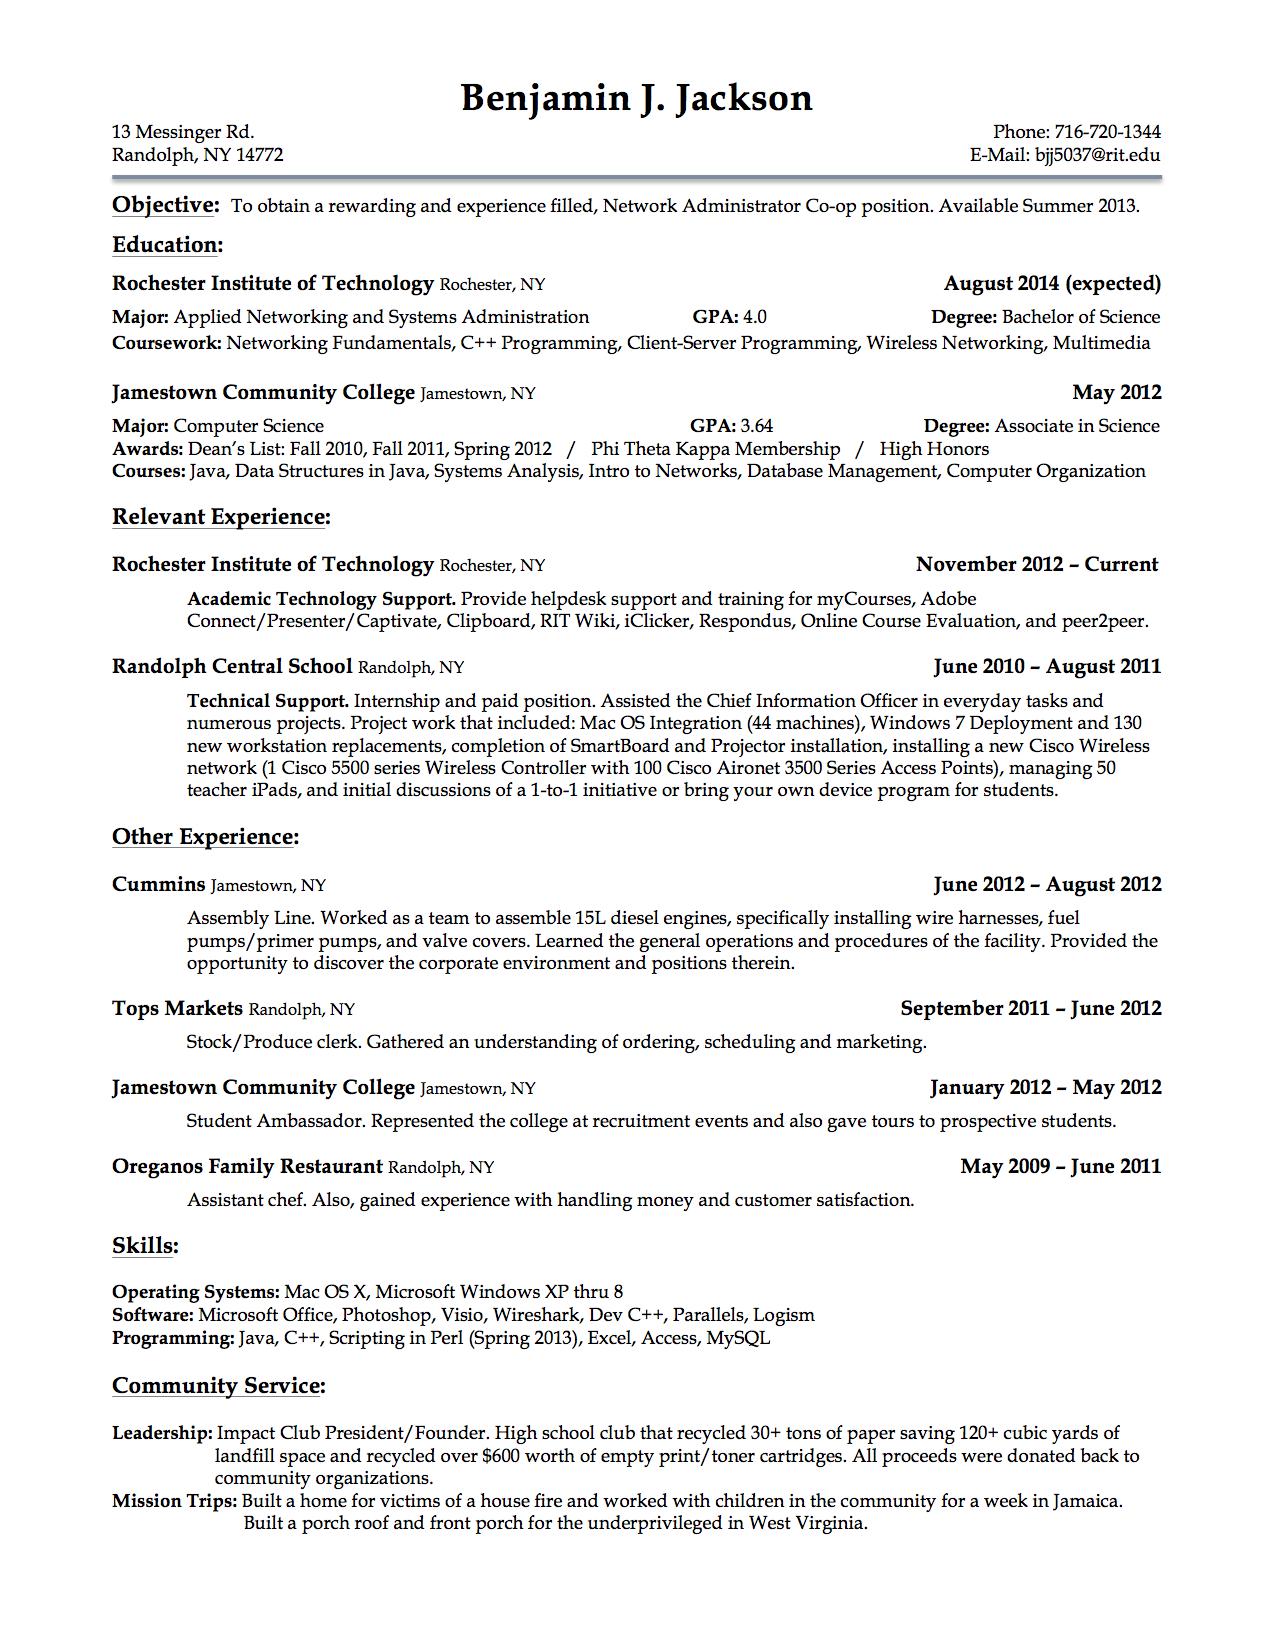 Epingle Sur Create Resume Free